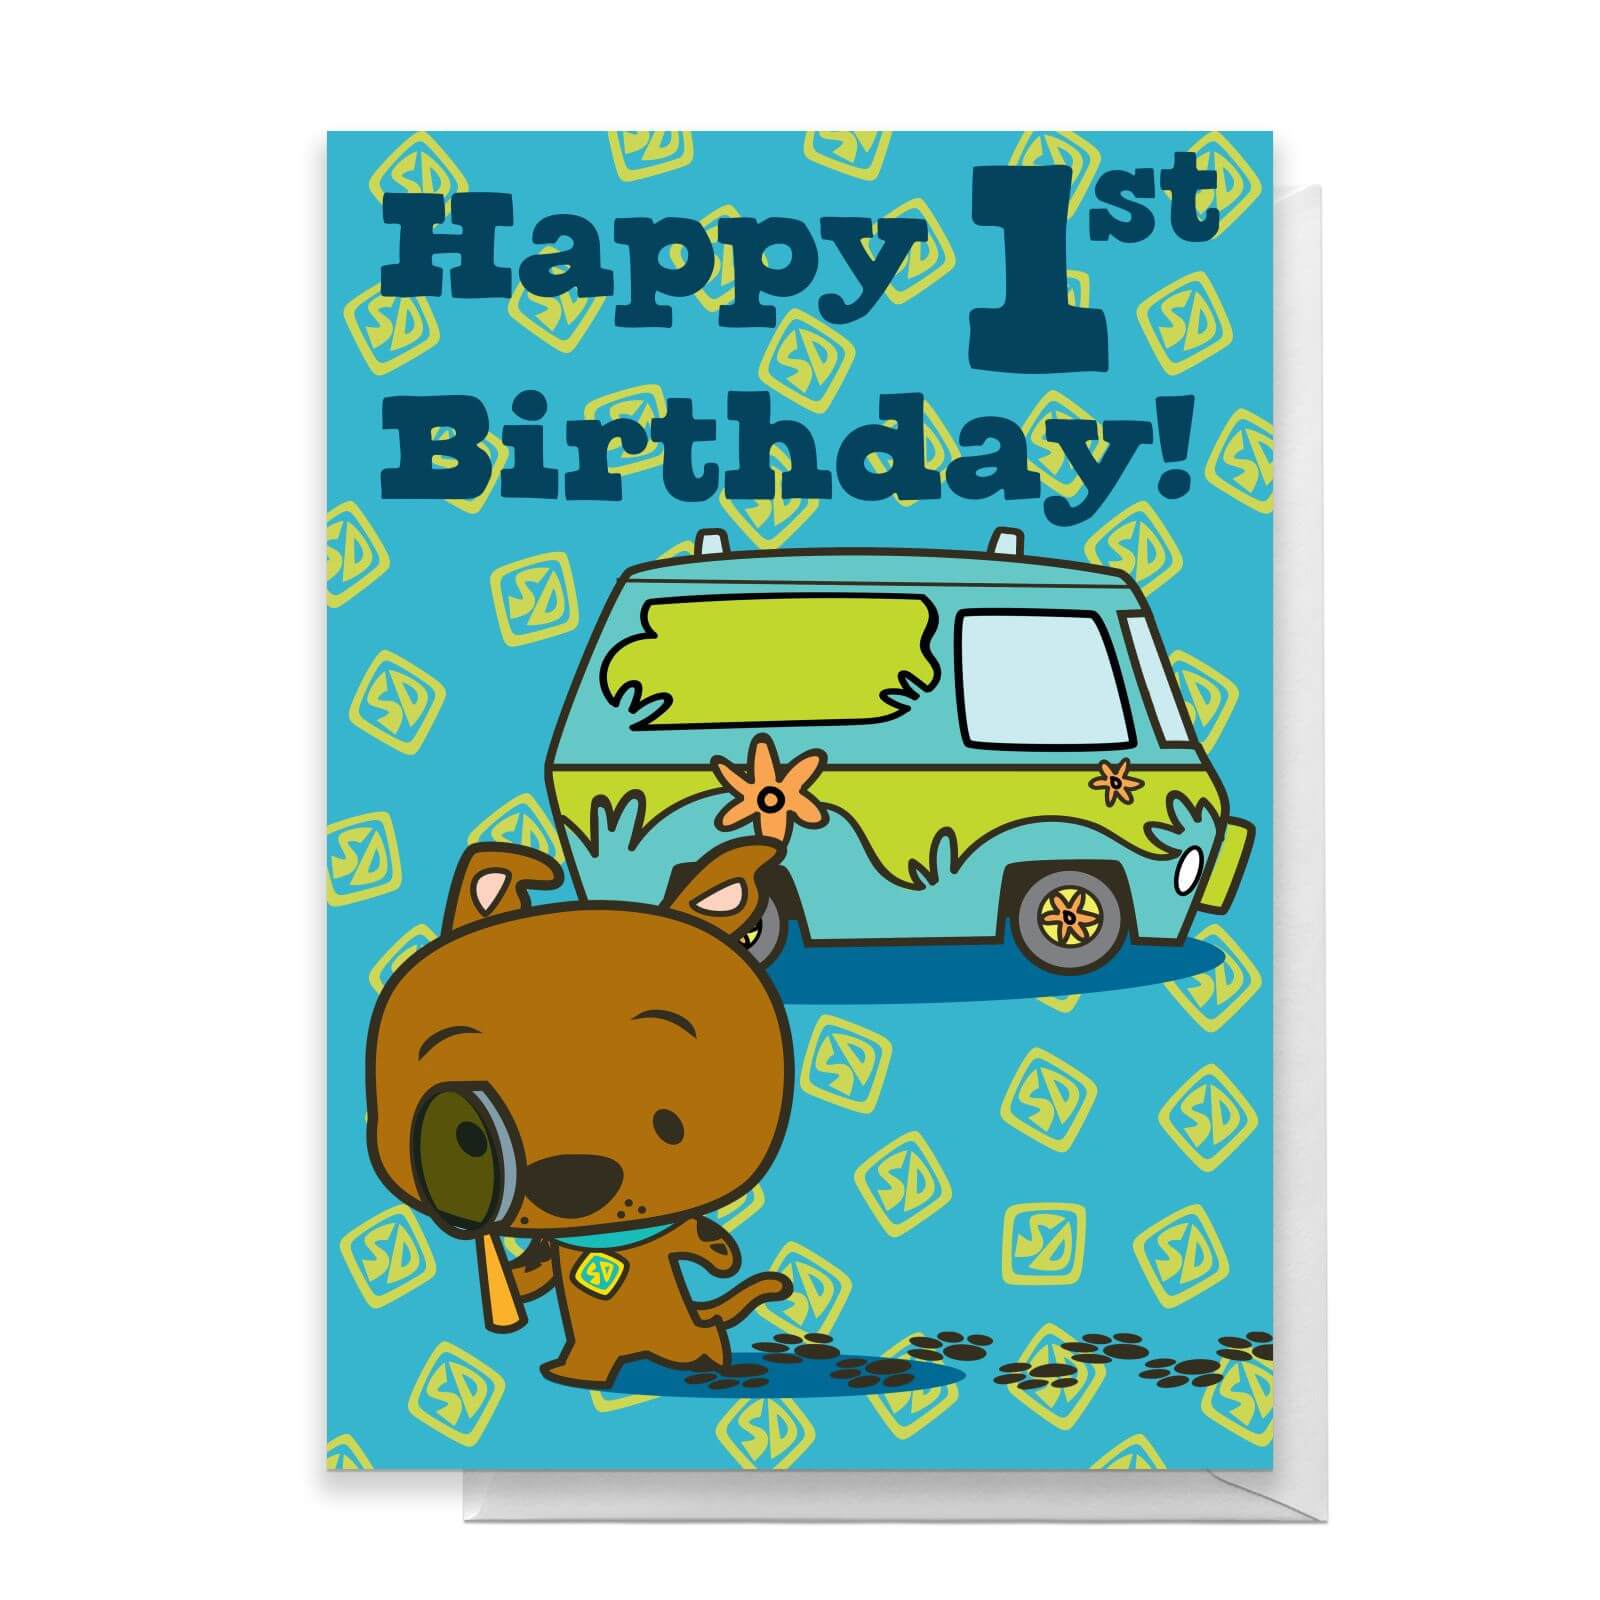 Scooby Doo 1st Birthday Greetings Card Standard Card